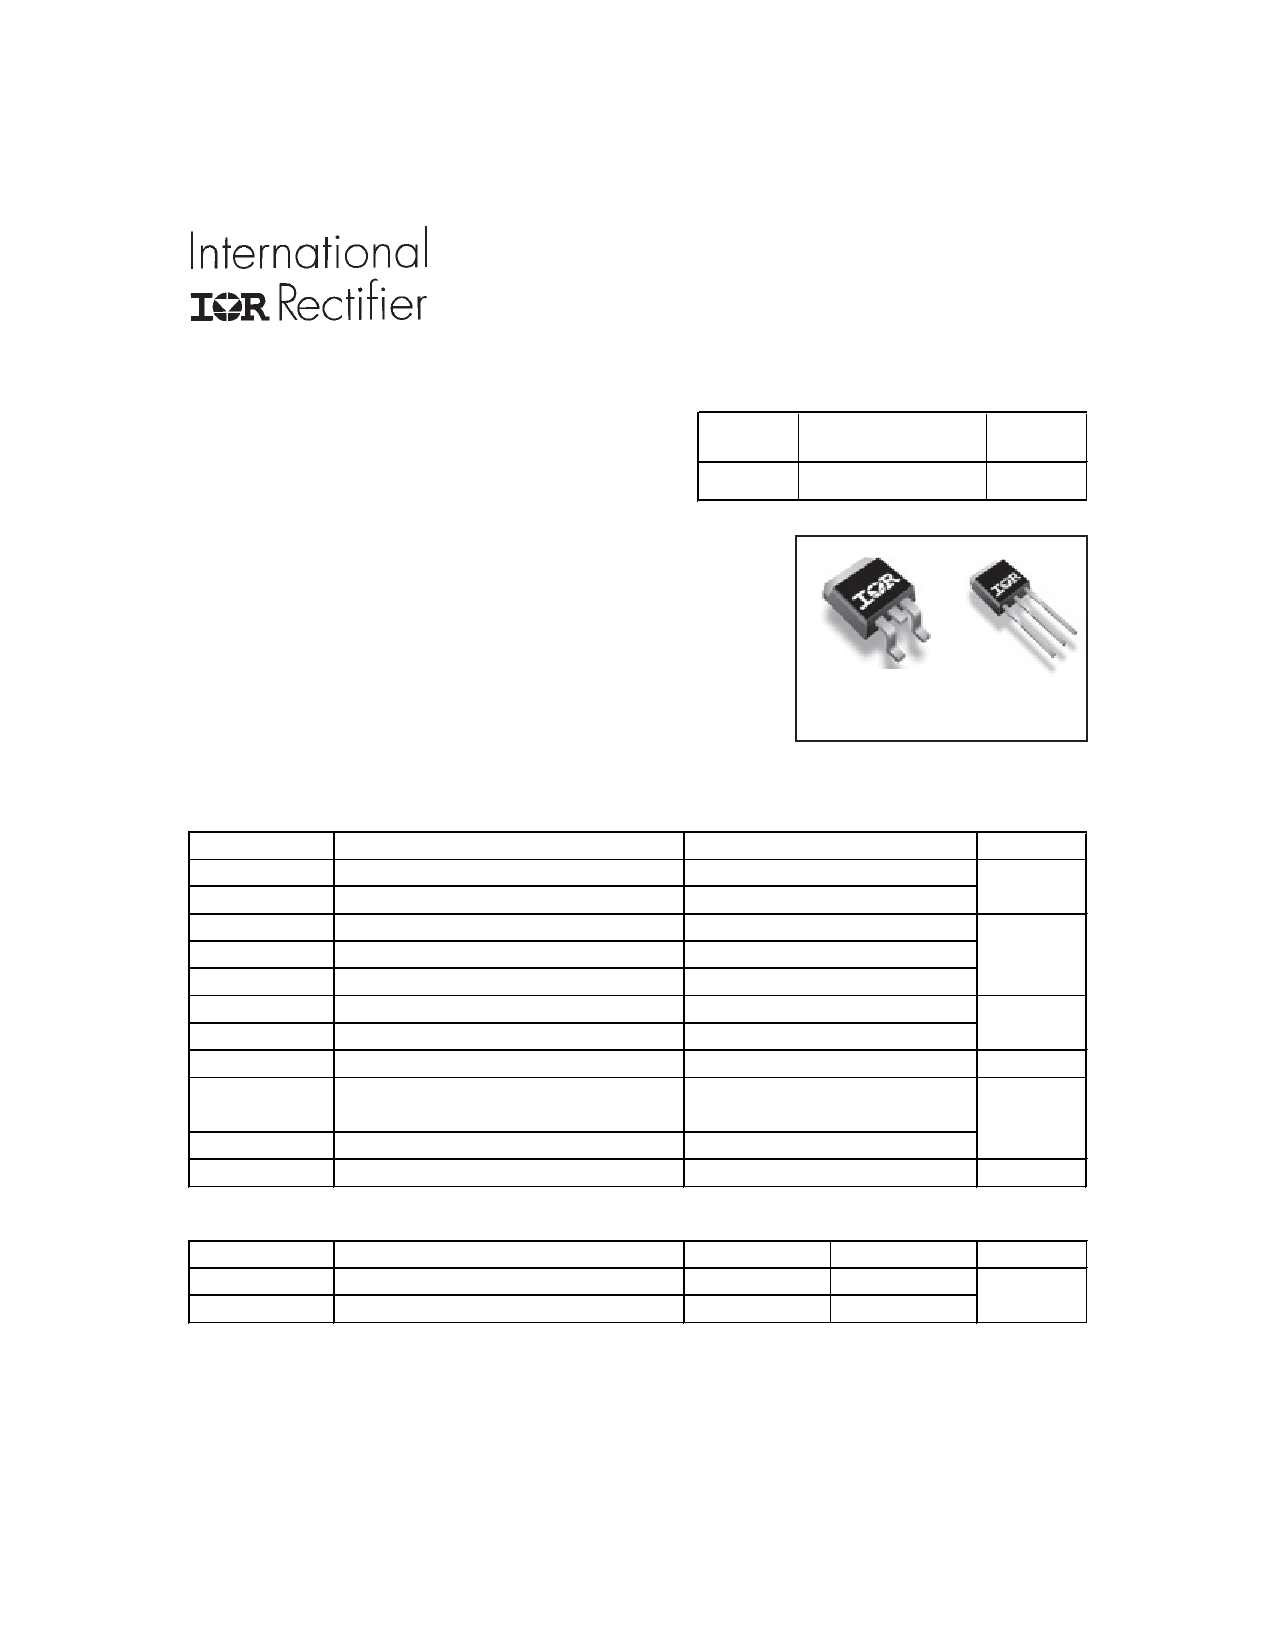 IRF3707ZCLPbF Datasheet, IRF3707ZCLPbF PDF,ピン配置, 機能